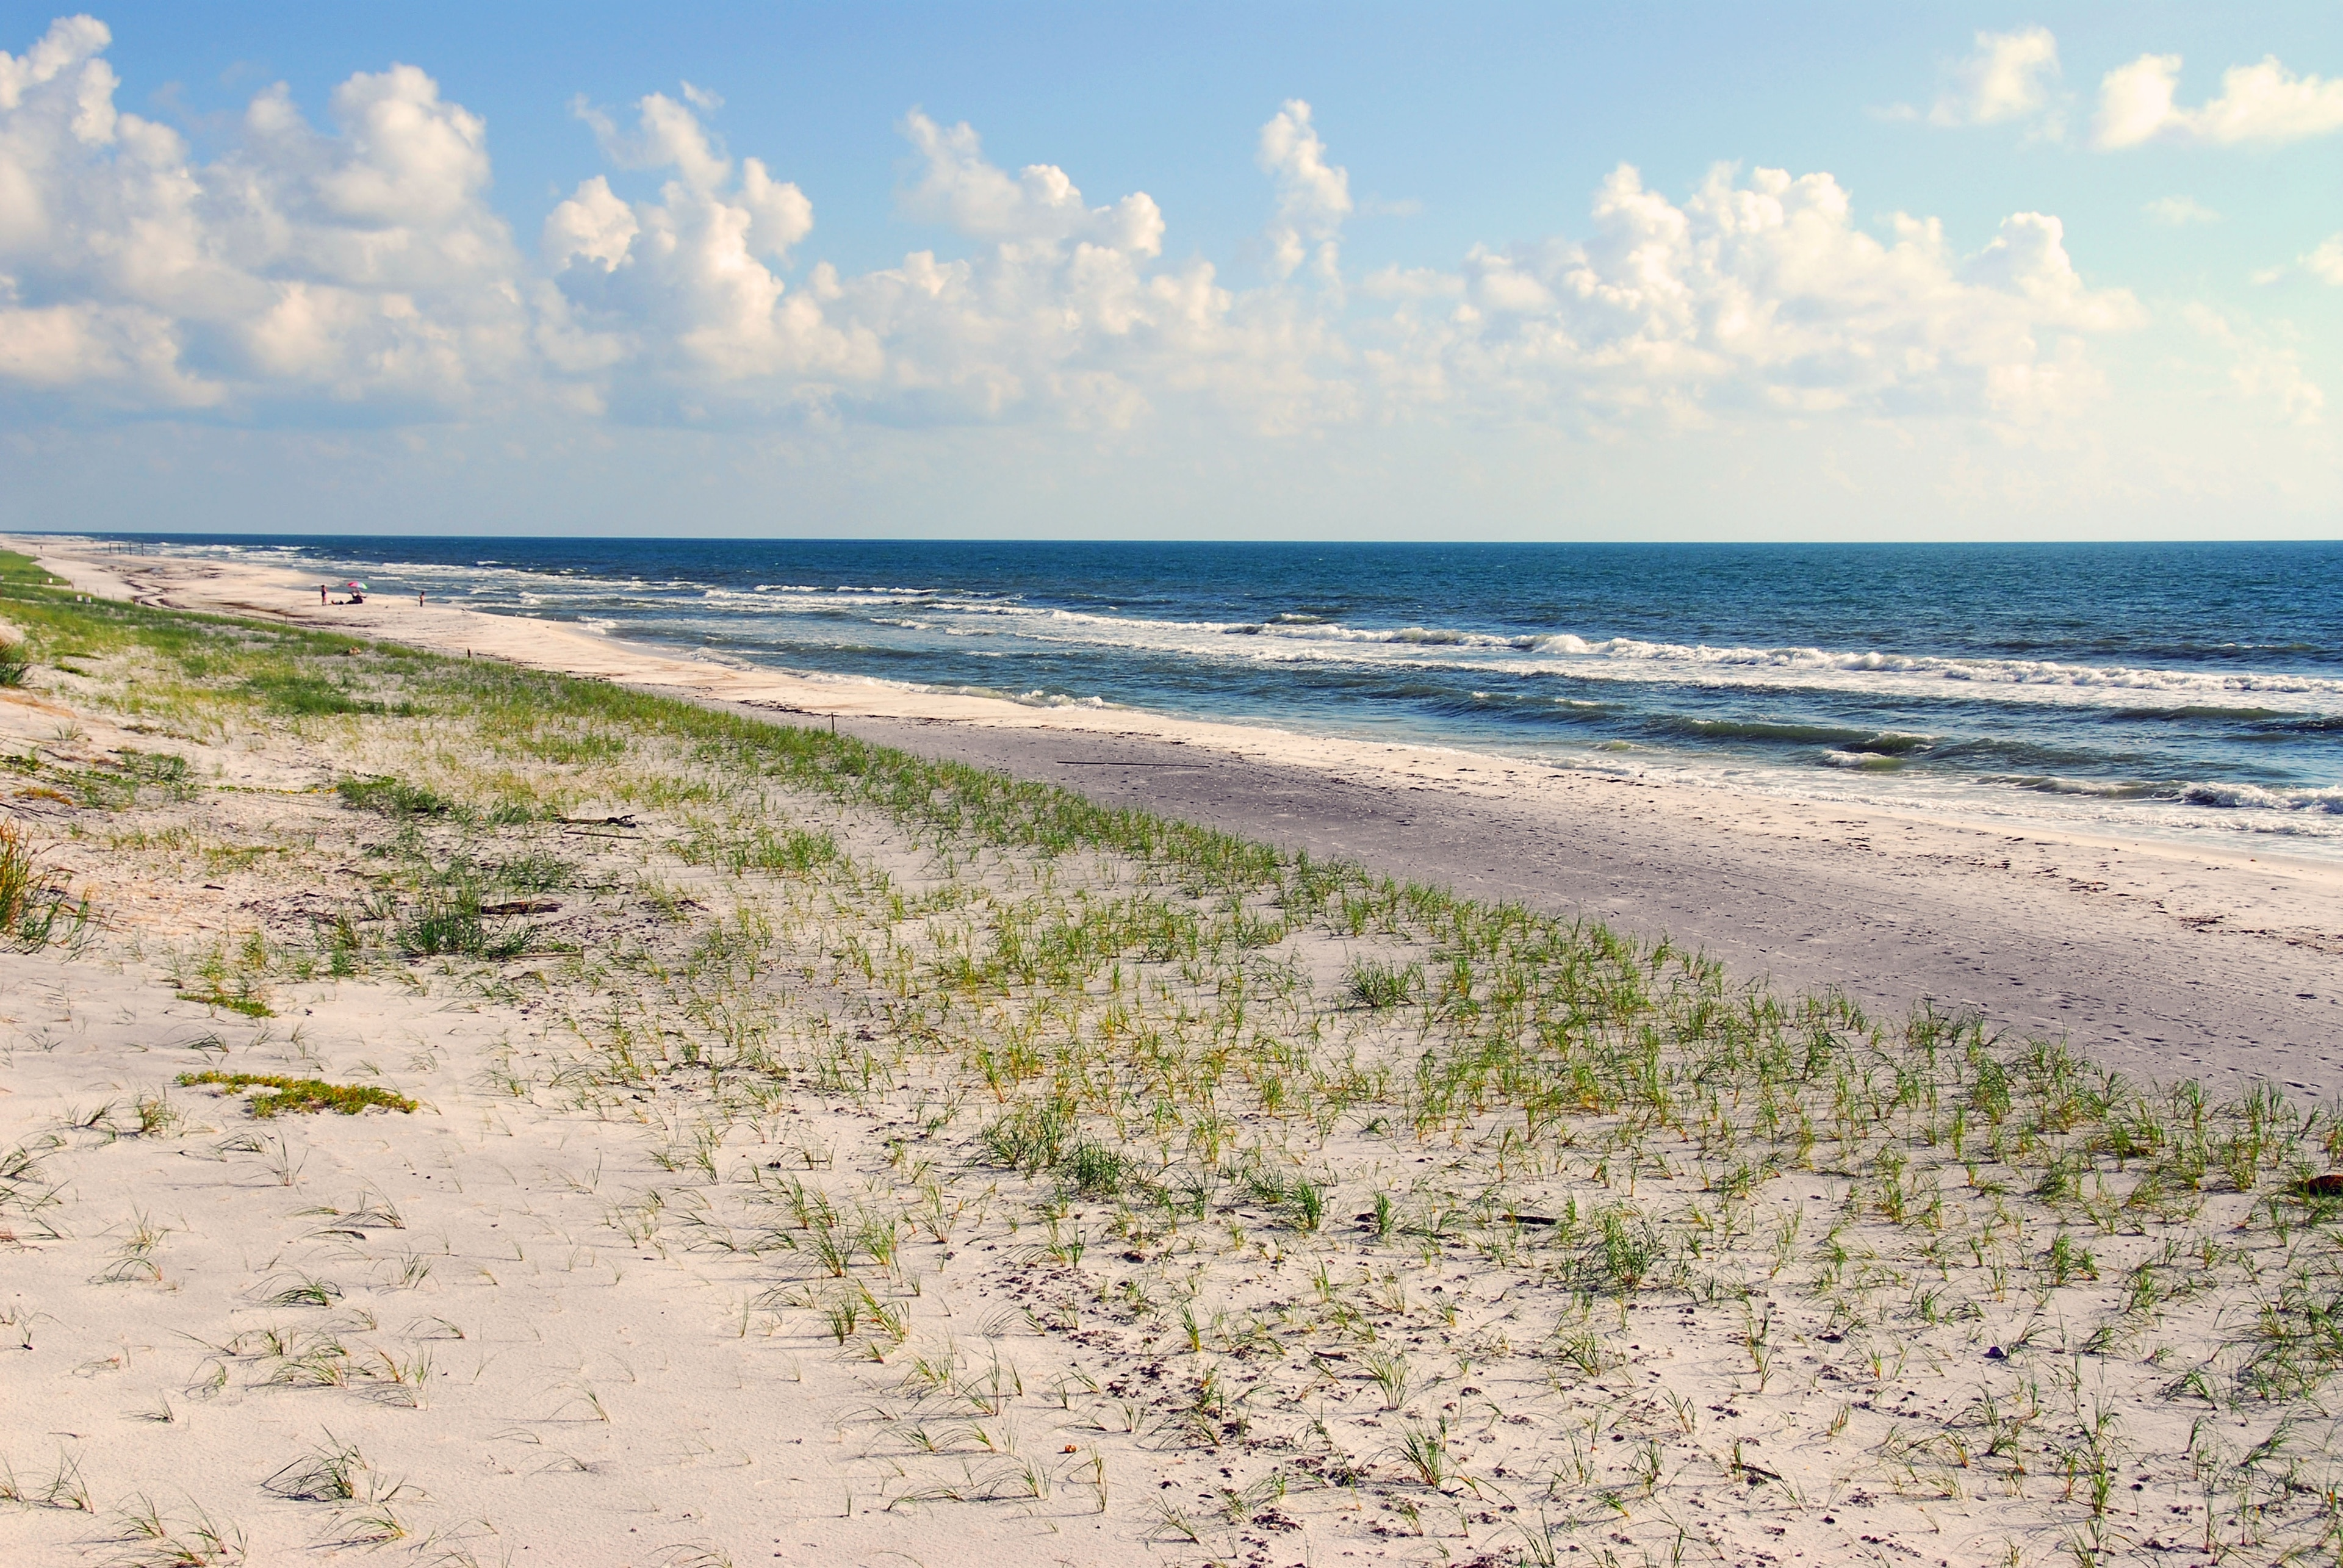 Gulf County, Florida, USA